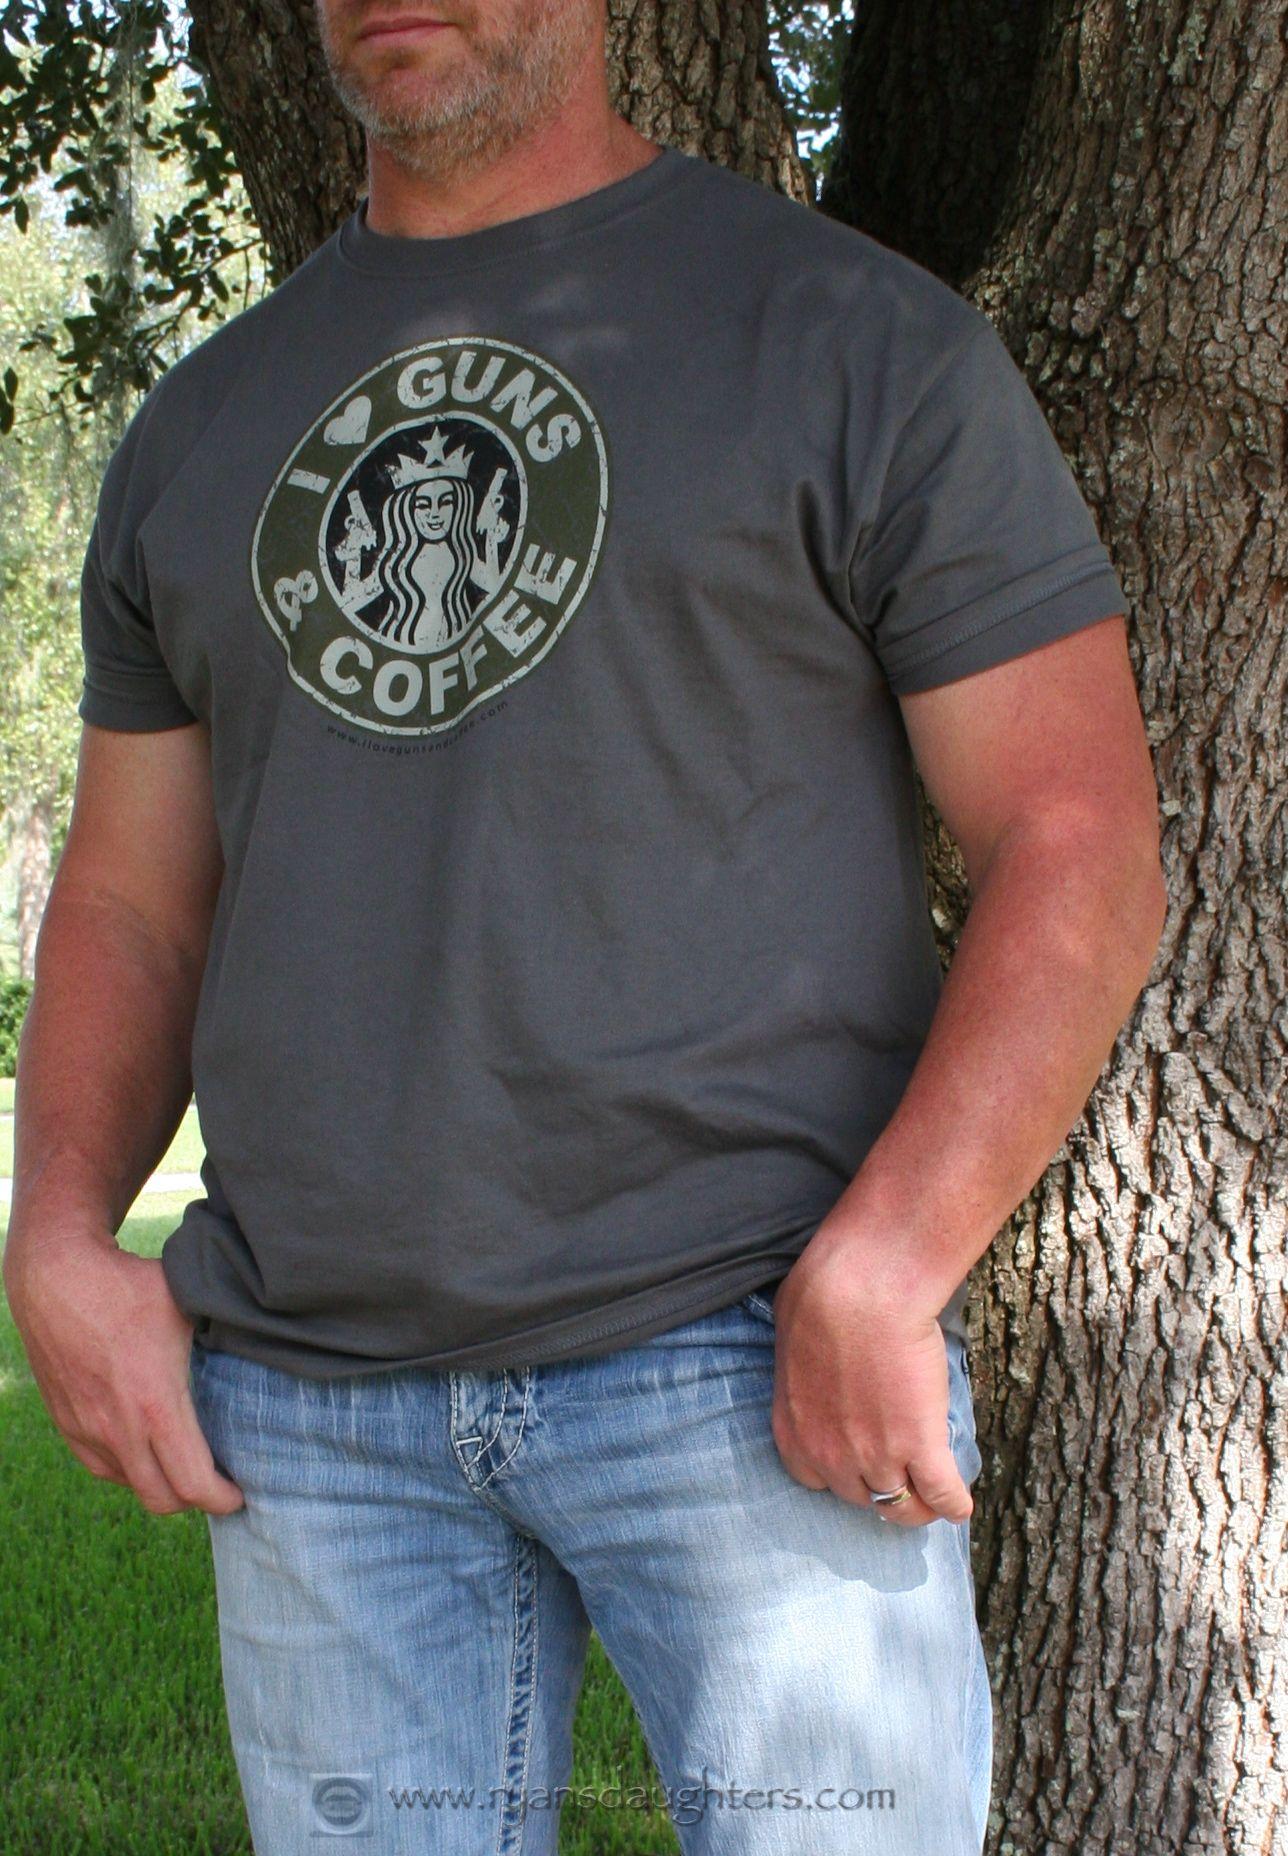 Men's Vintage I Love Guns & Coffee shirt @ www.ryansdaughters.com